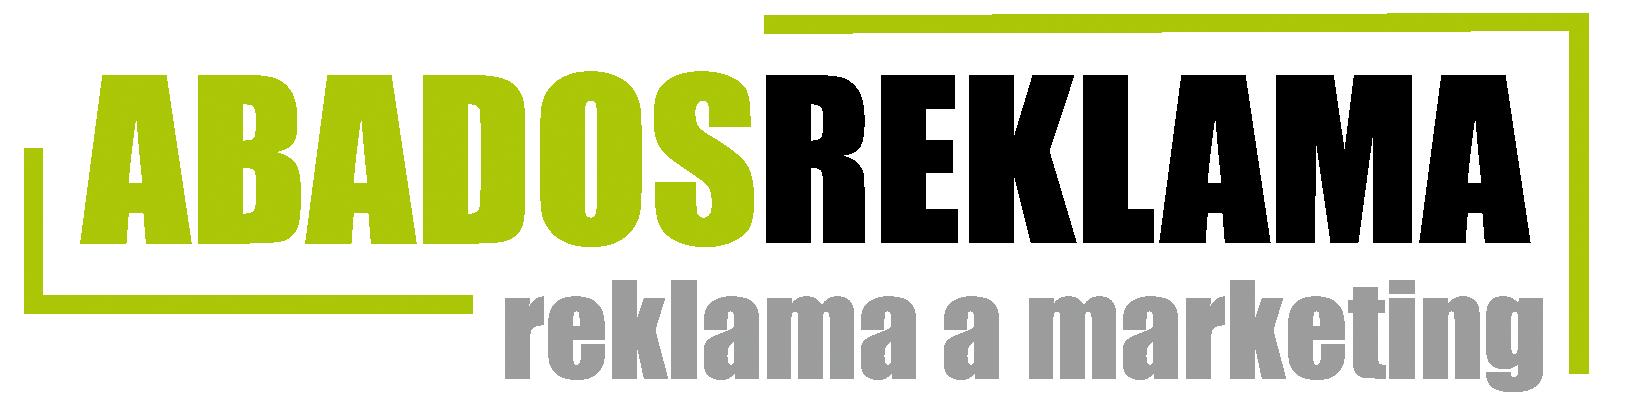 ABADOSREKLAMA logo wo bg